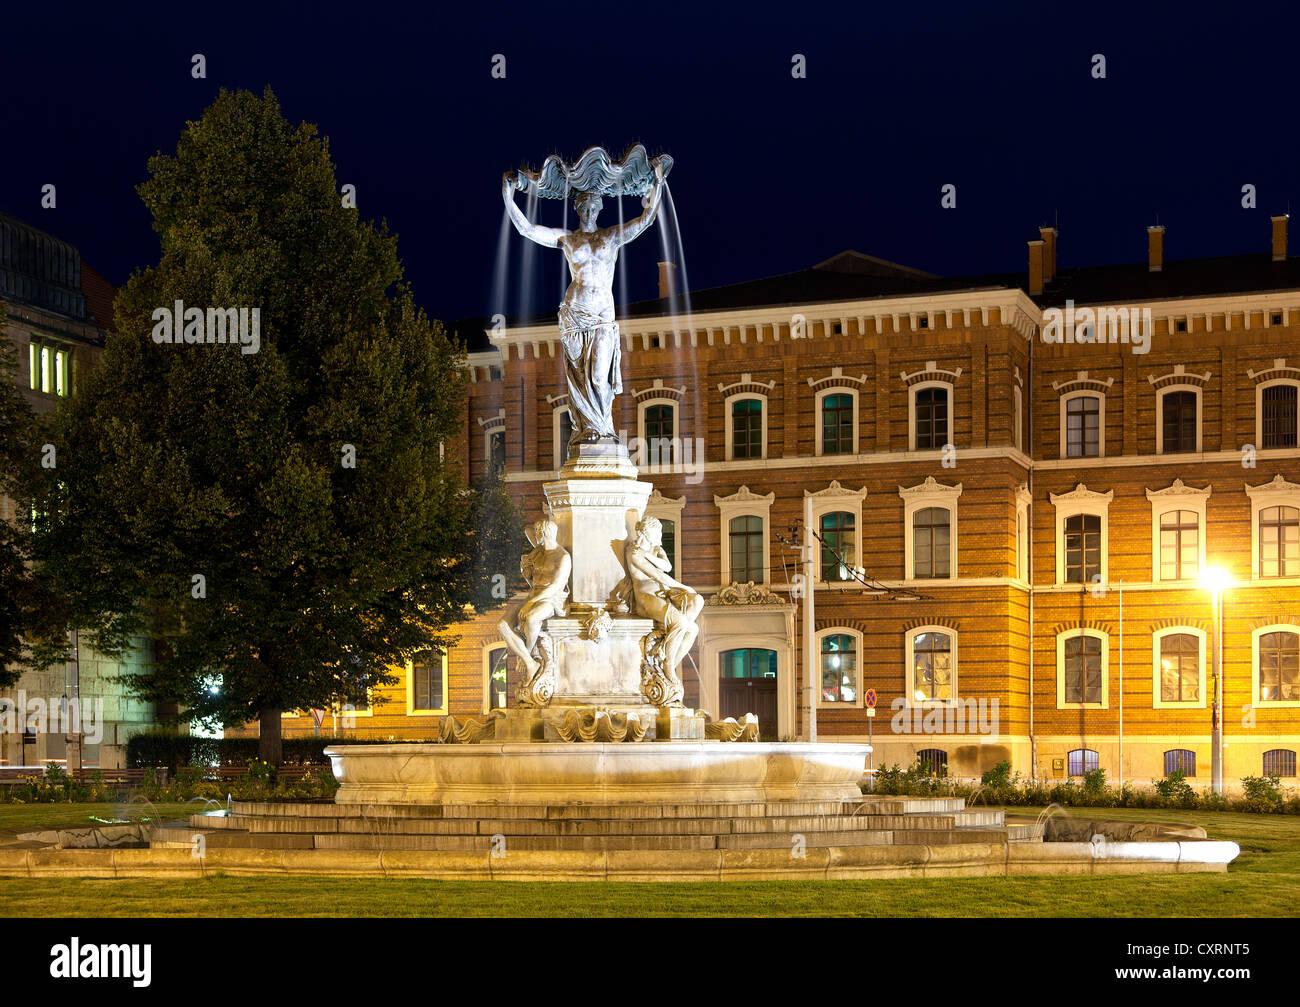 Muschelminna well, district court, Postplatz square, Goerlitz, Upper Lusatia, Lusatia, Saxony, Germany, Europe, - Stock Image